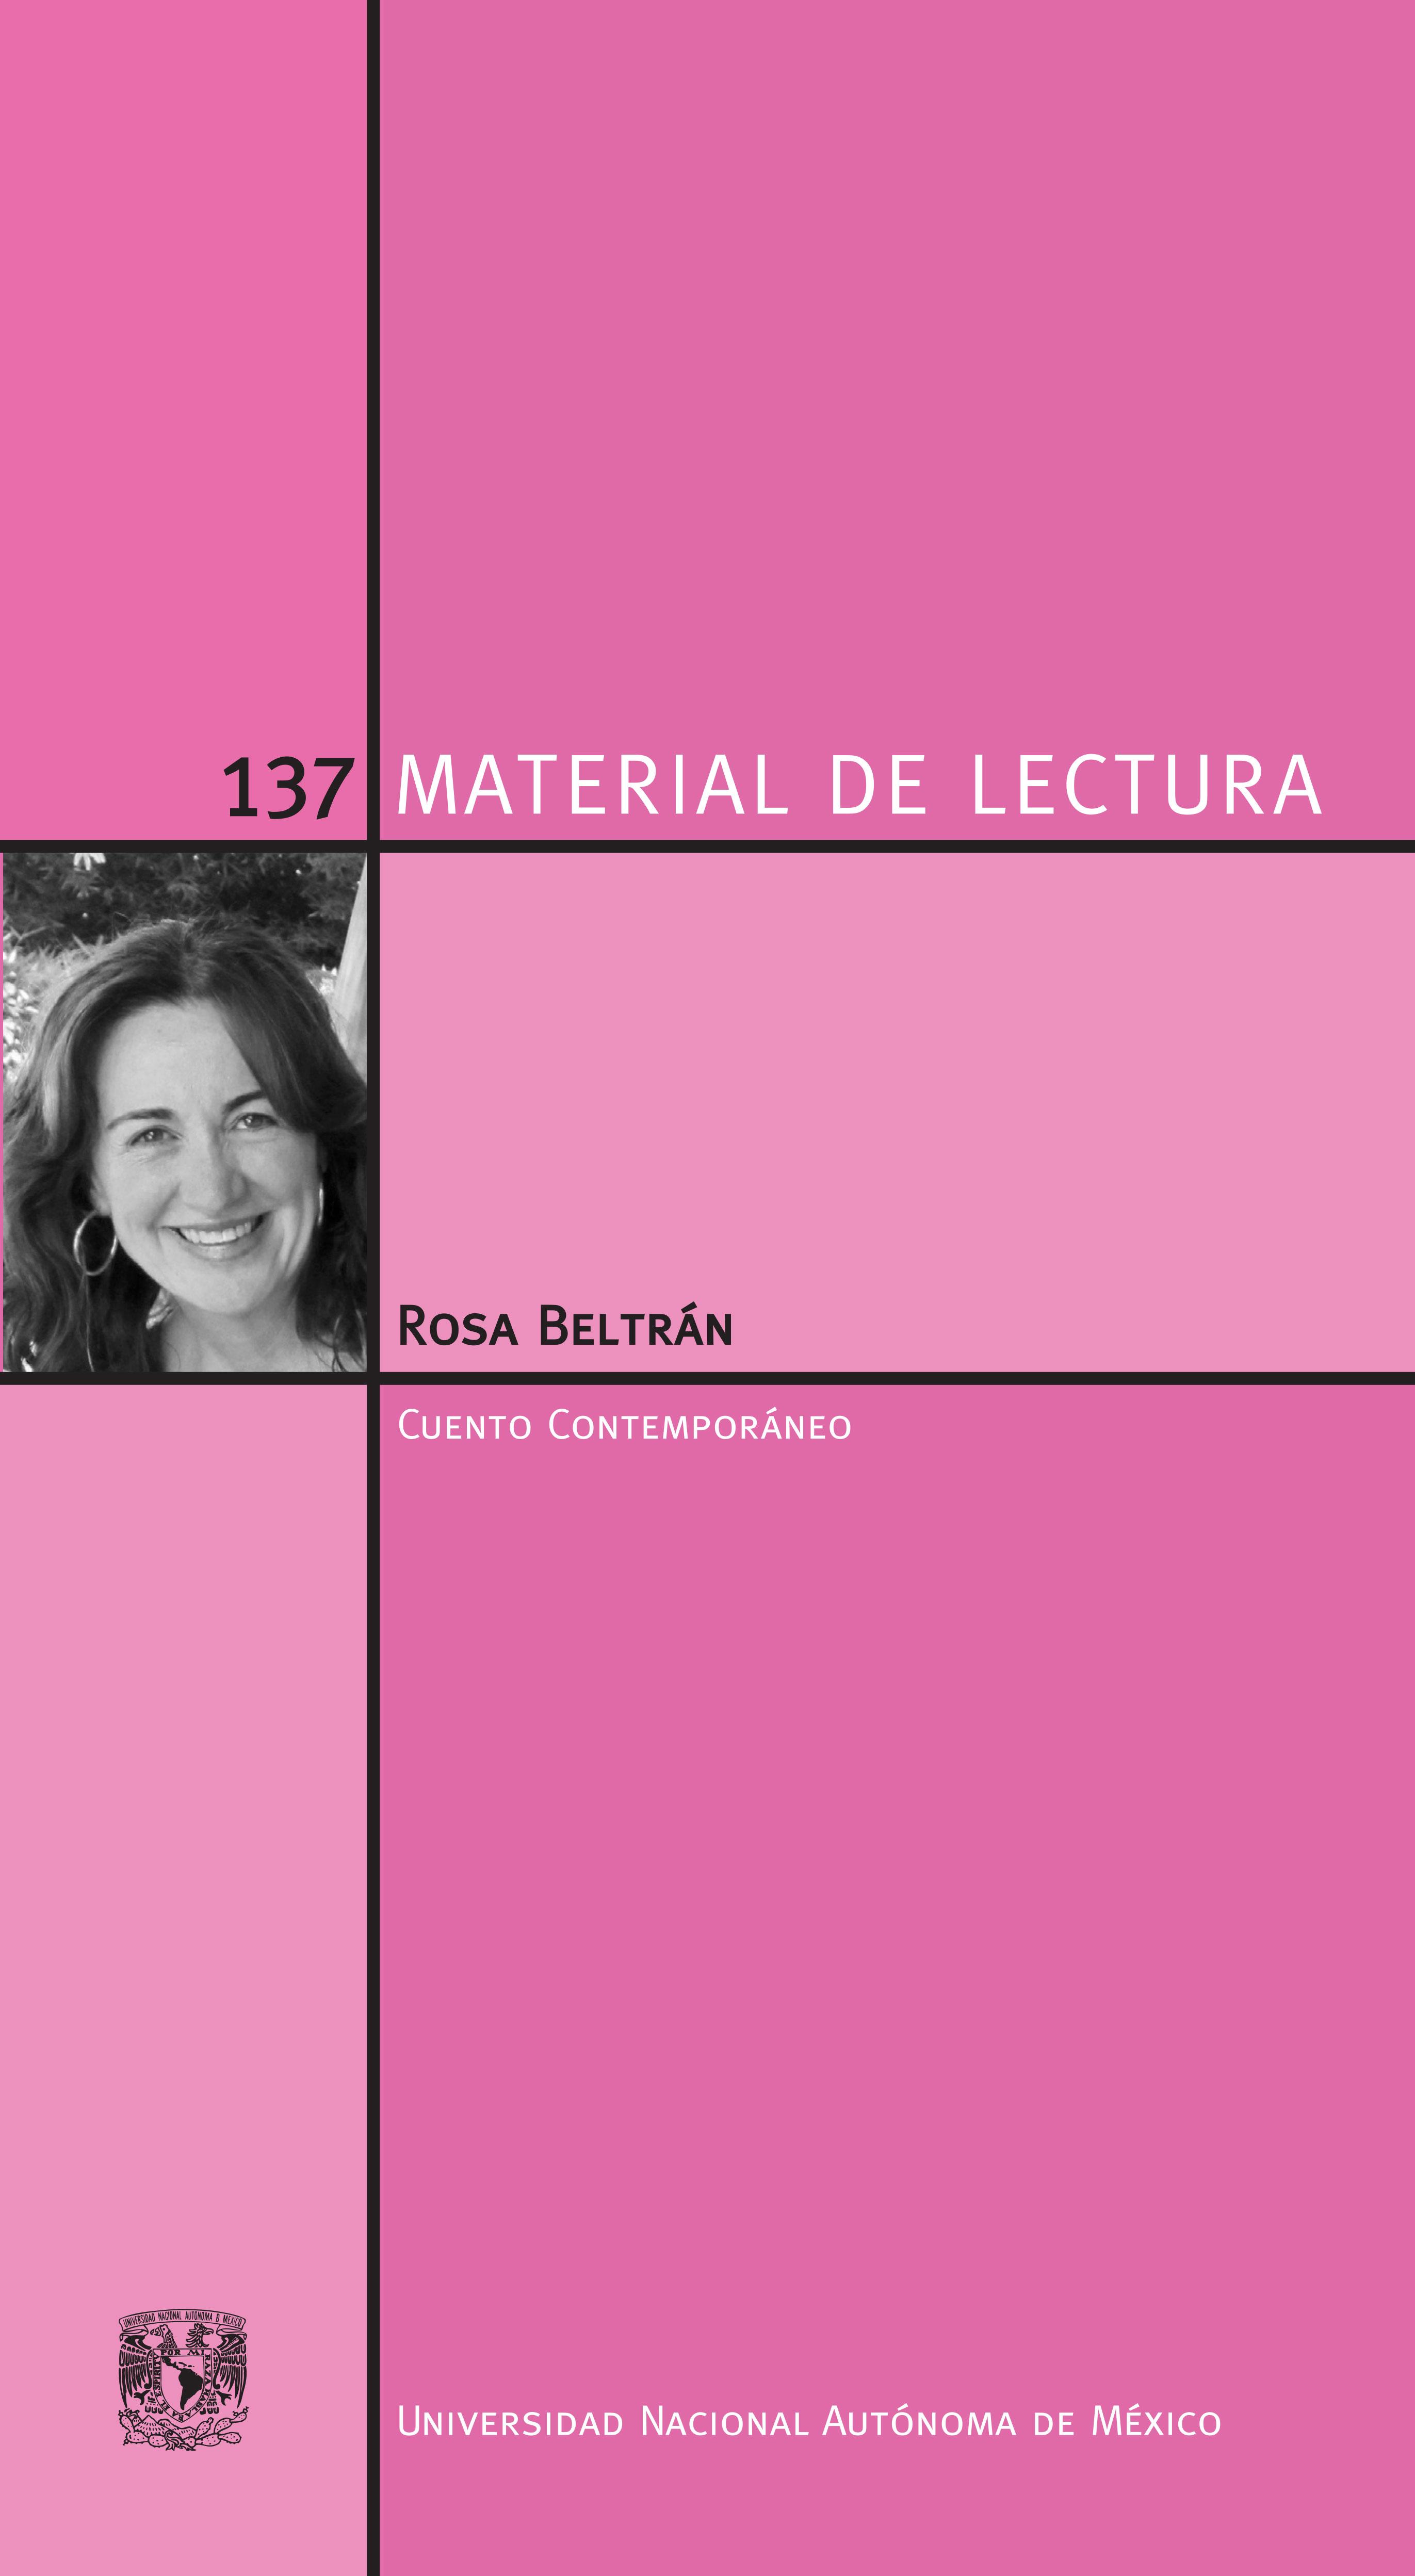 Rosa Beltrán. Material de Lectura 137